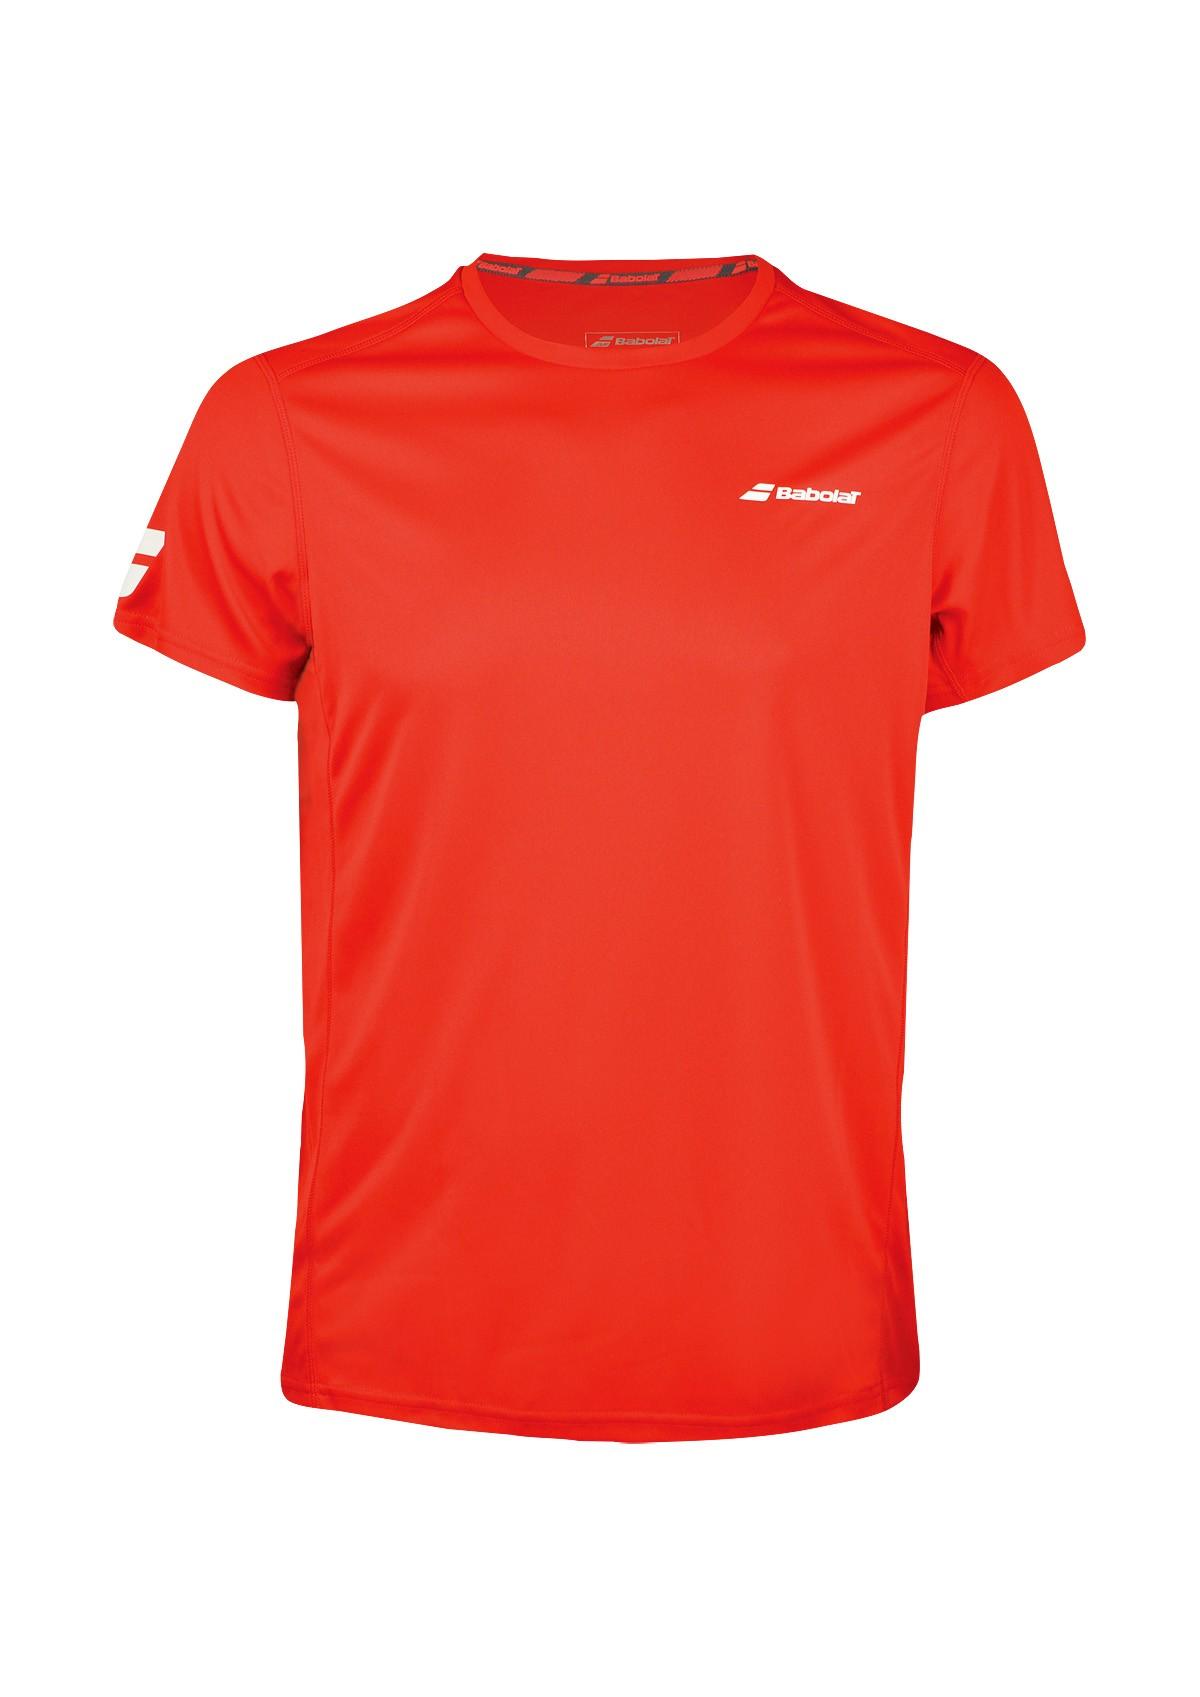 Koszulka tenisowa chłopięca Babolat CORE T-shirt Red